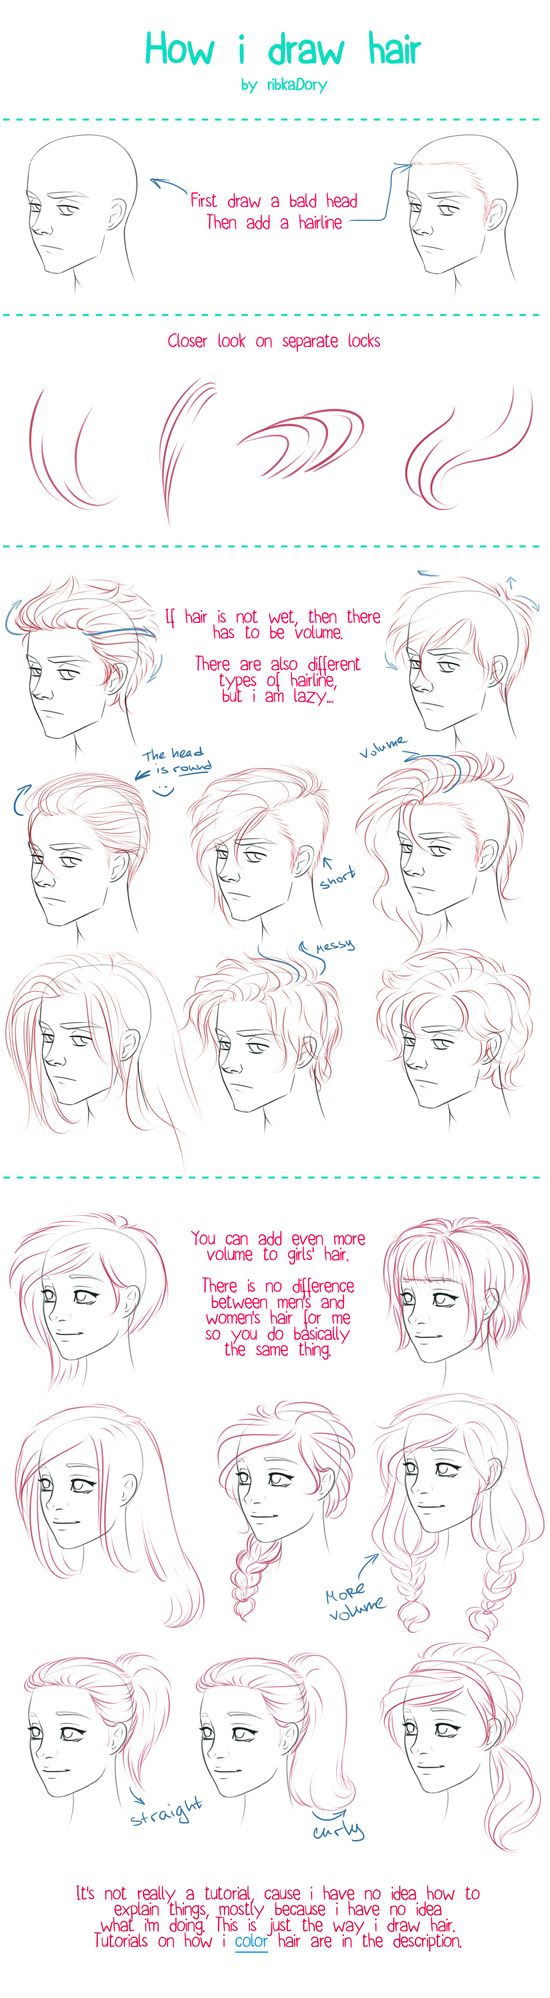 drawing hair  Board